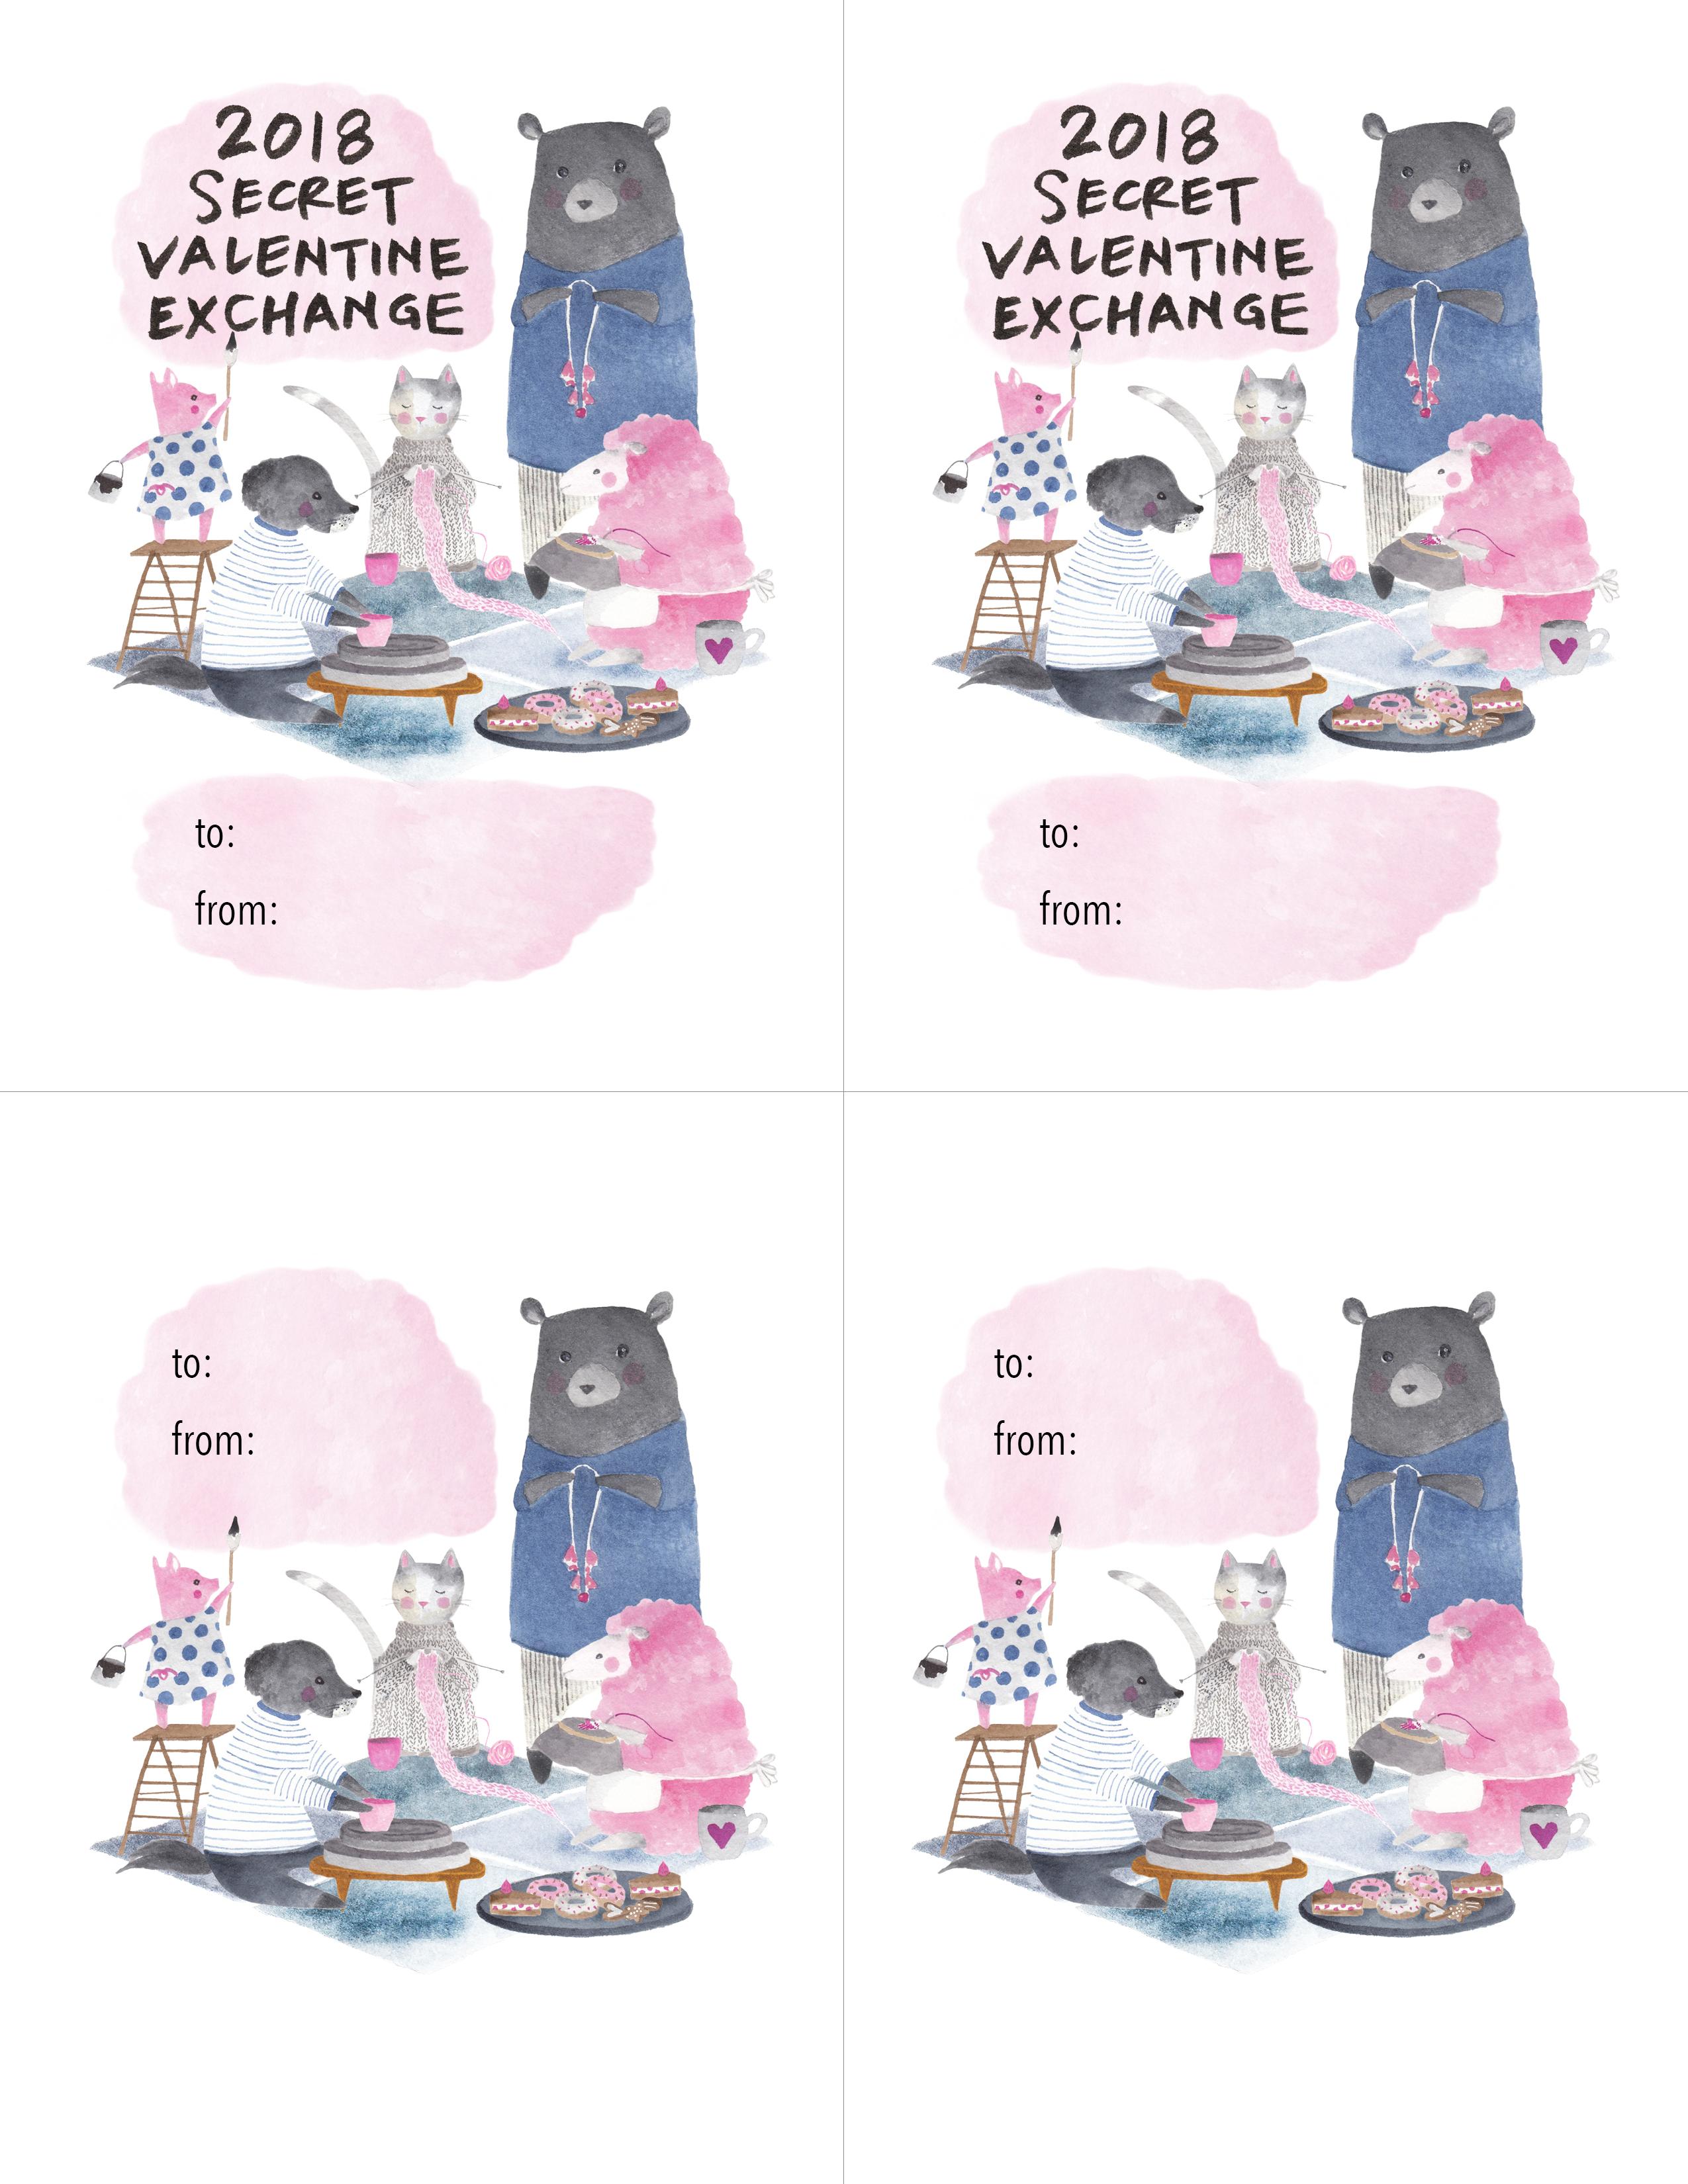 Secret Valentine Exchange Sanae Ishida